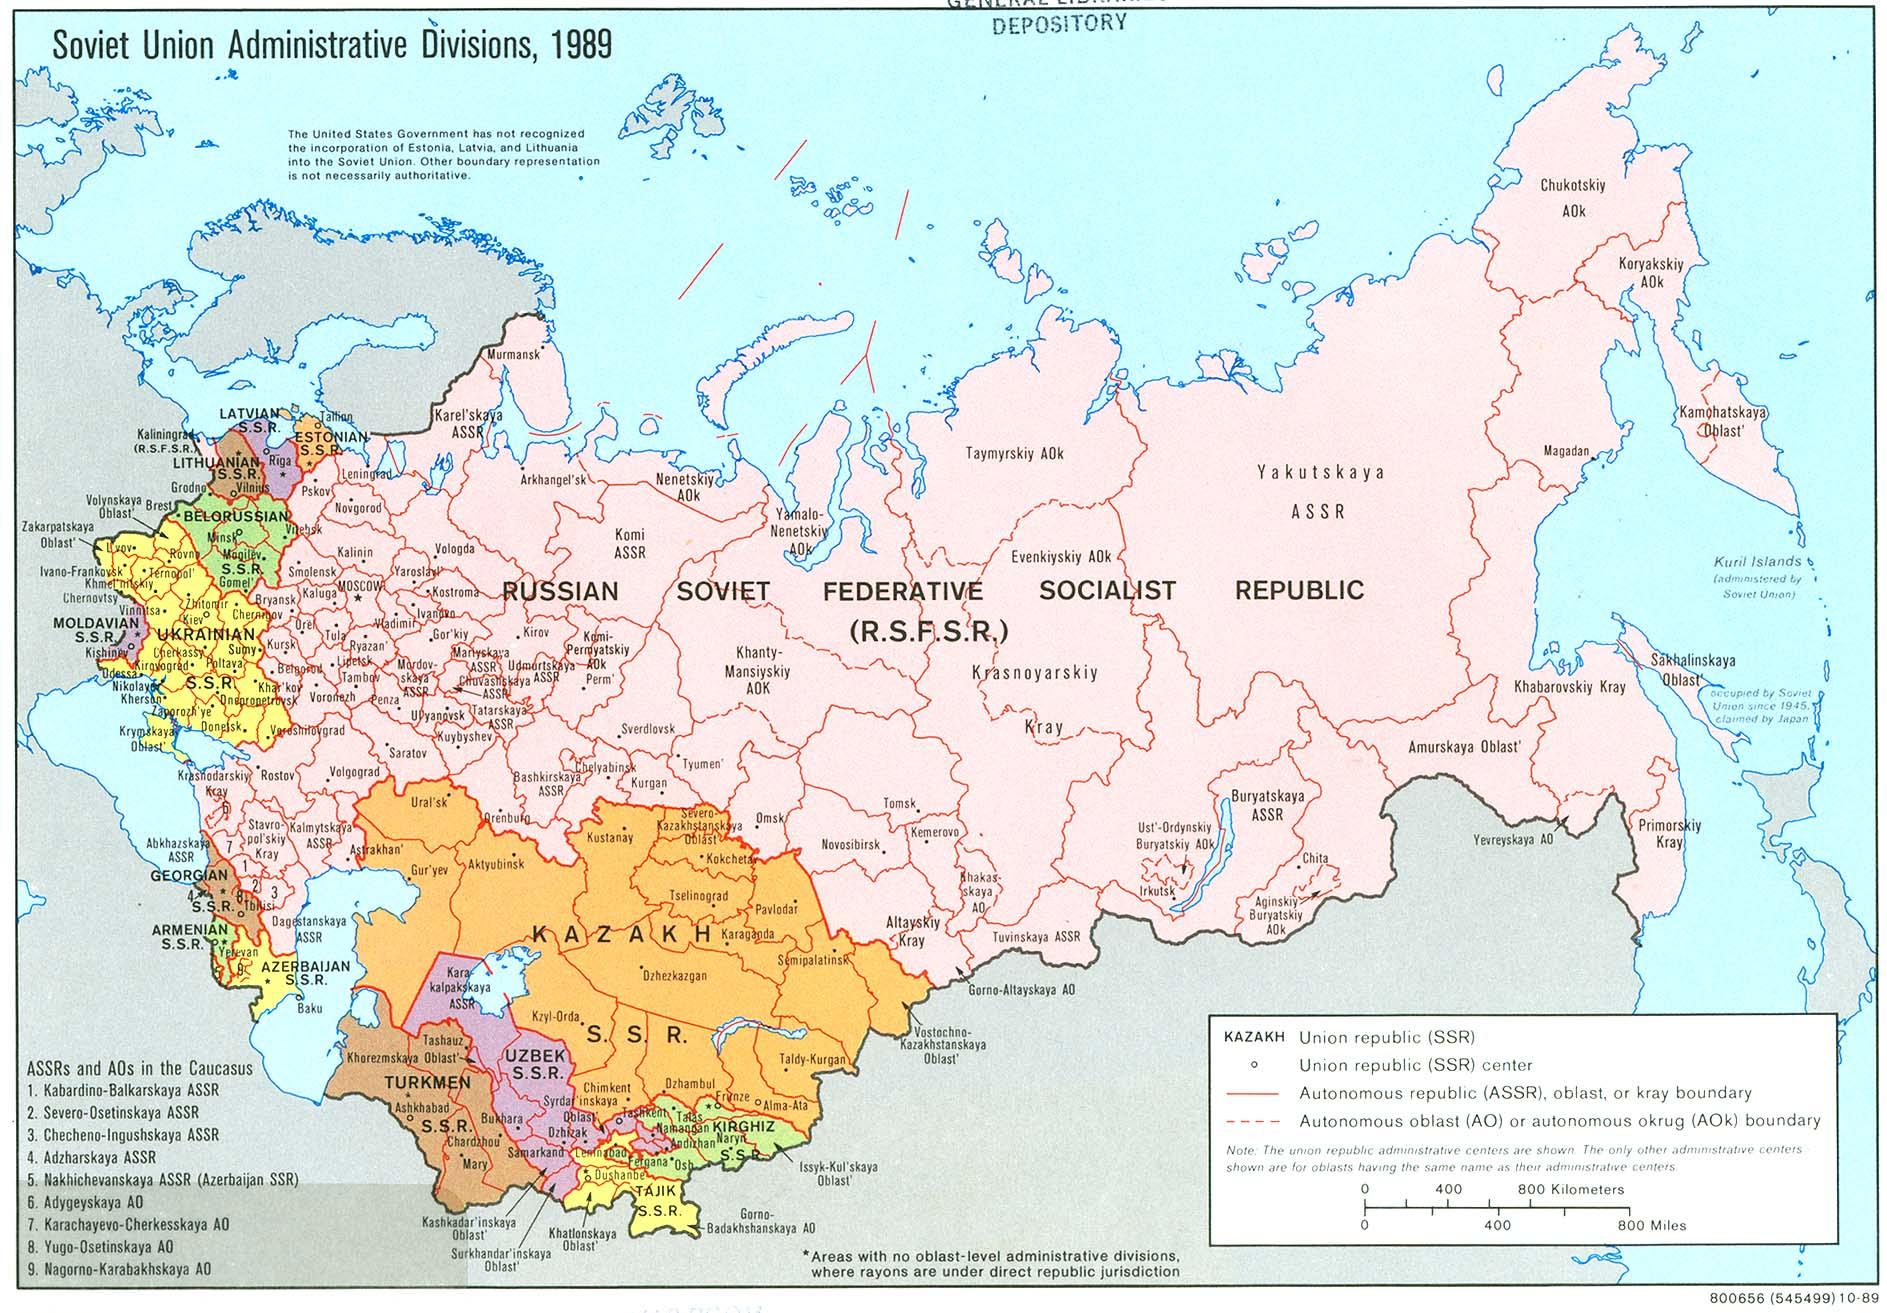 Soviet_Union_Administrative_Divisions_1989.jpg